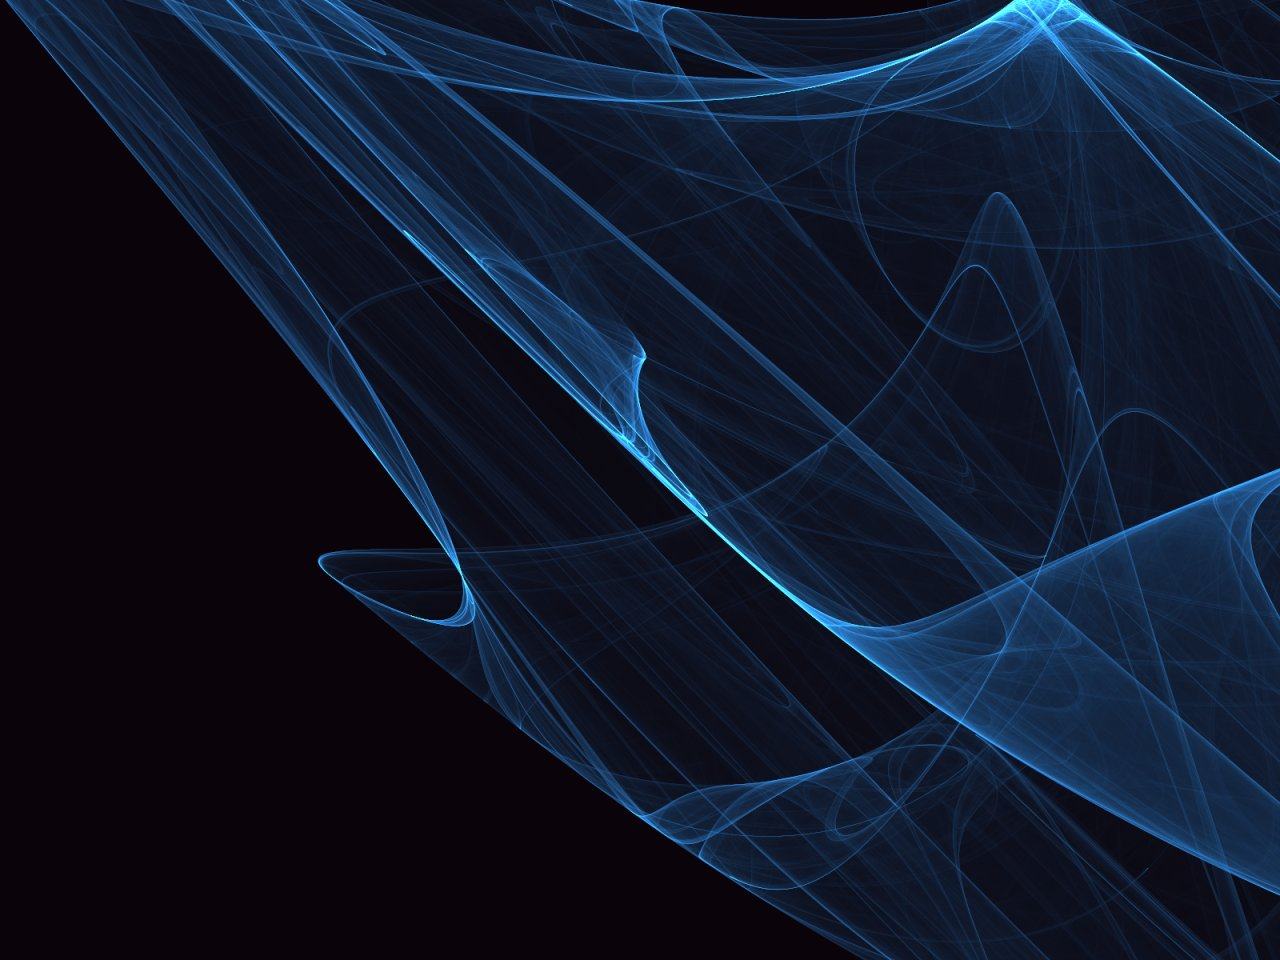 blue-twister-1280x1024-nokde